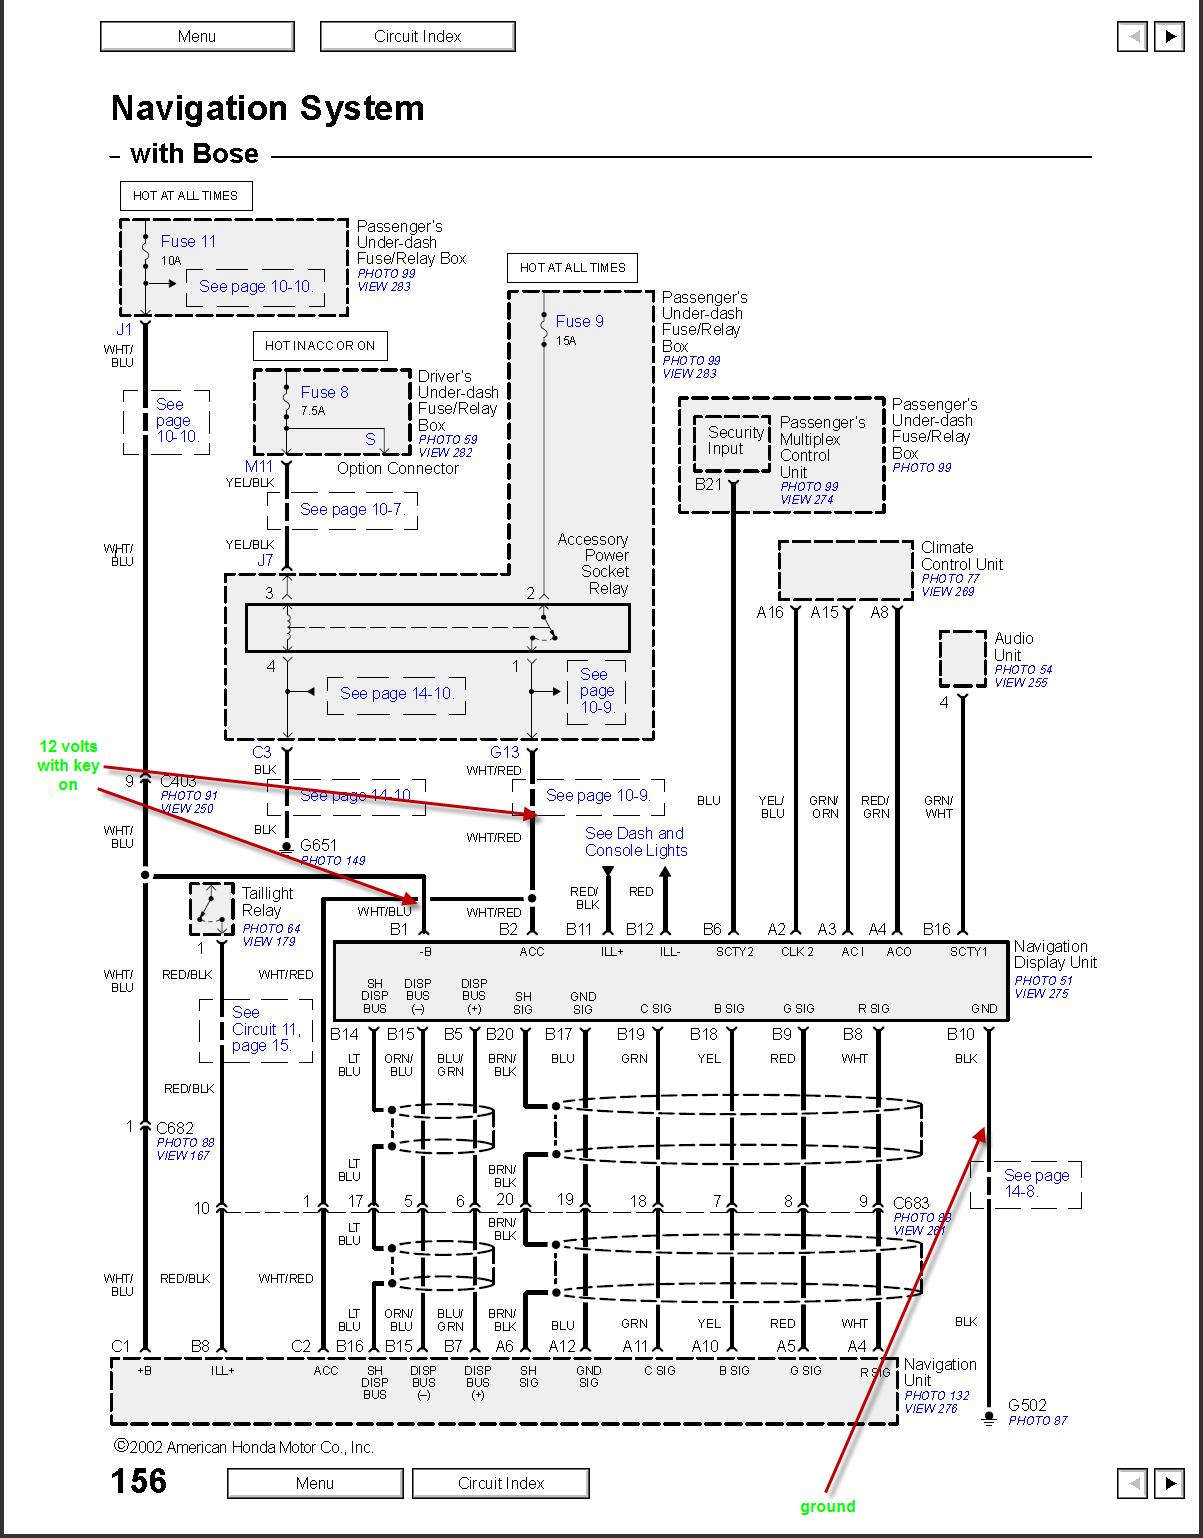 1997 Acura Rl Wiring Diagram - Wiring Diagram